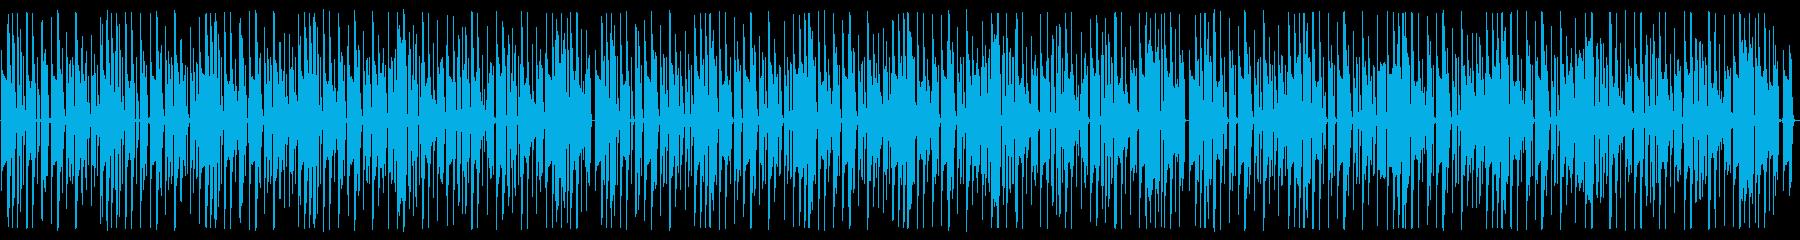 YouTube コミカルなピアノ・日常の再生済みの波形